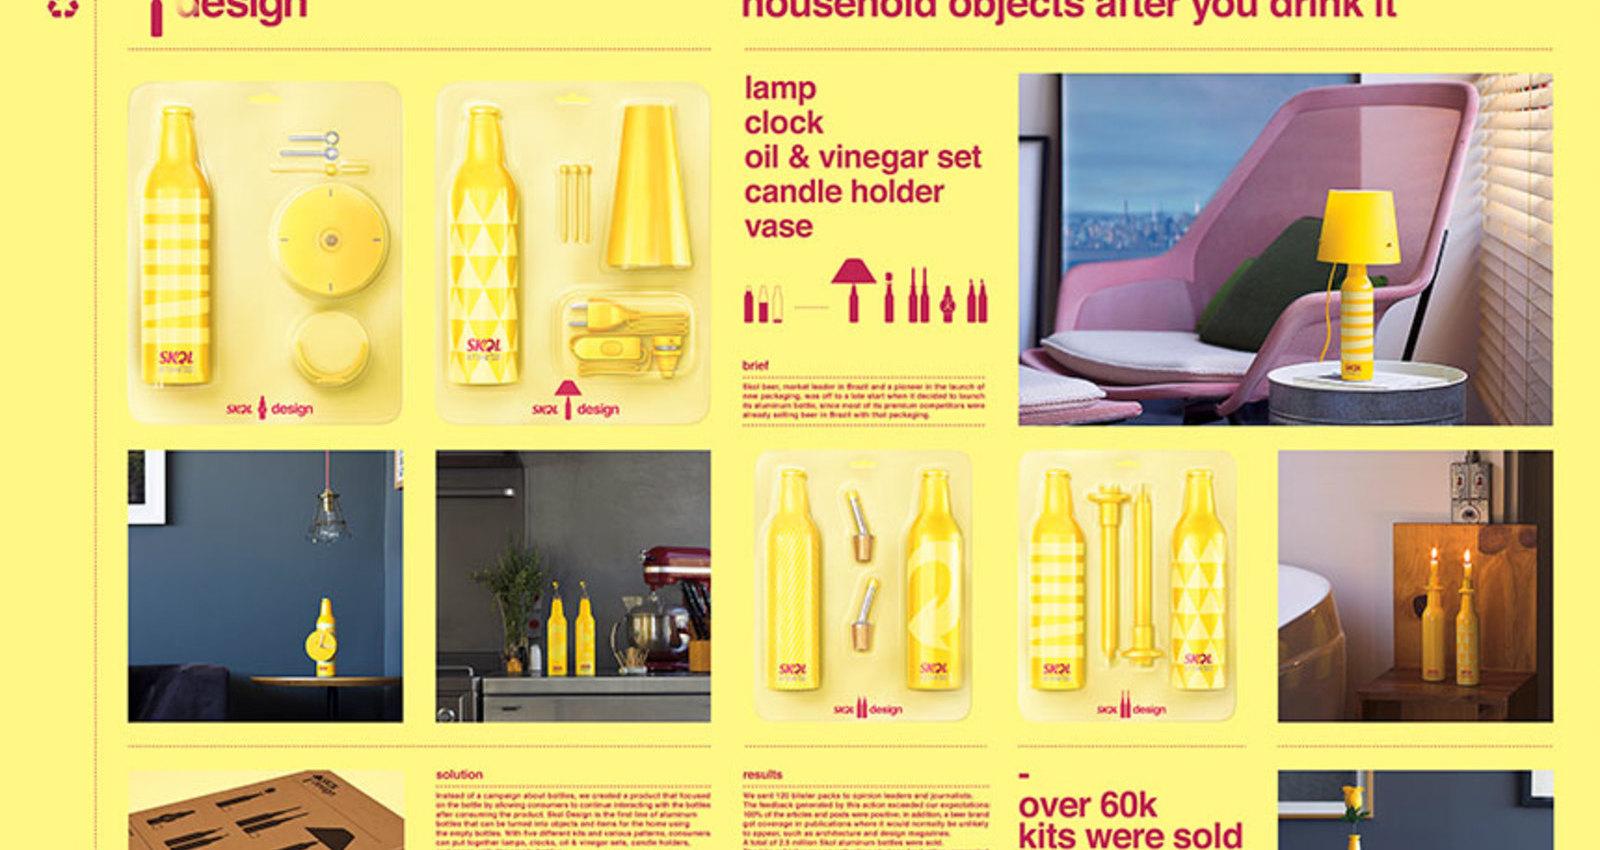 Skol Design - Blisters (1 to 5)